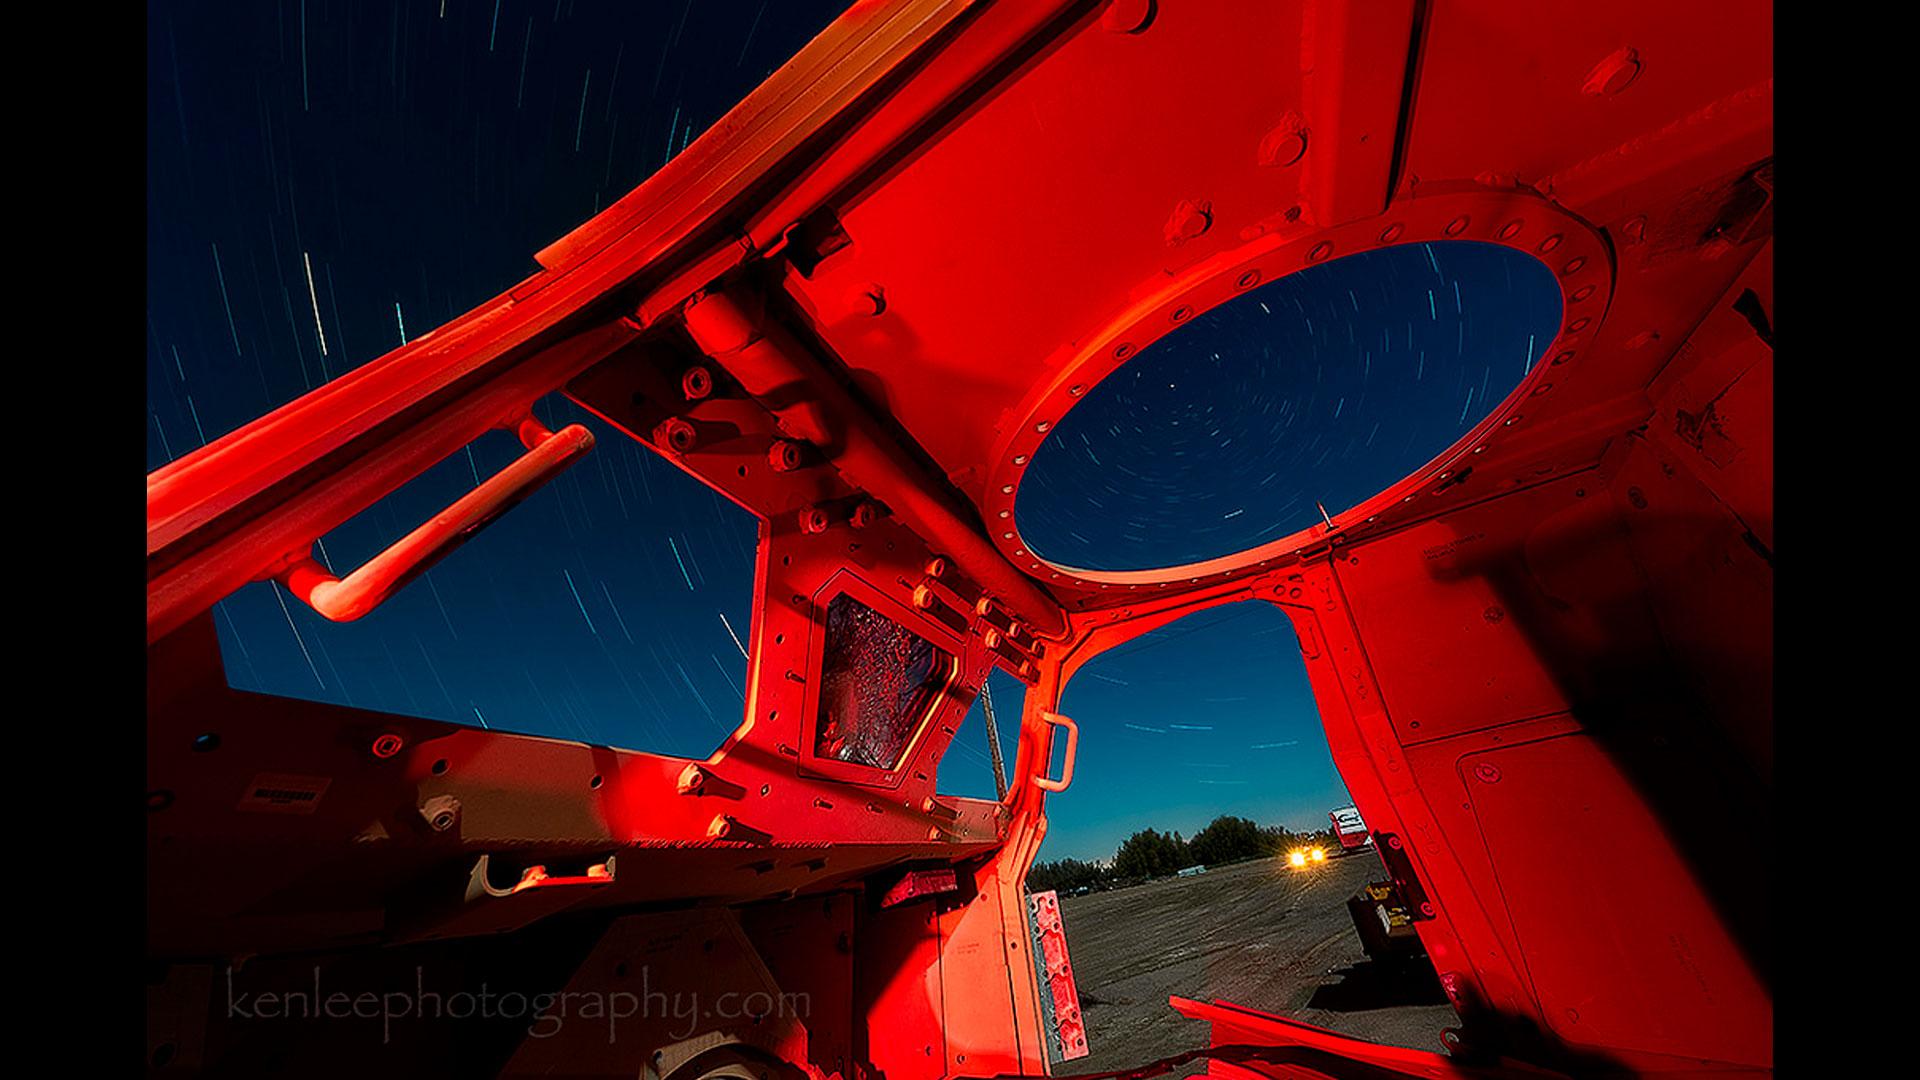 Astrophotography | Photographer: Ken LeeCurator: Bryan Esler